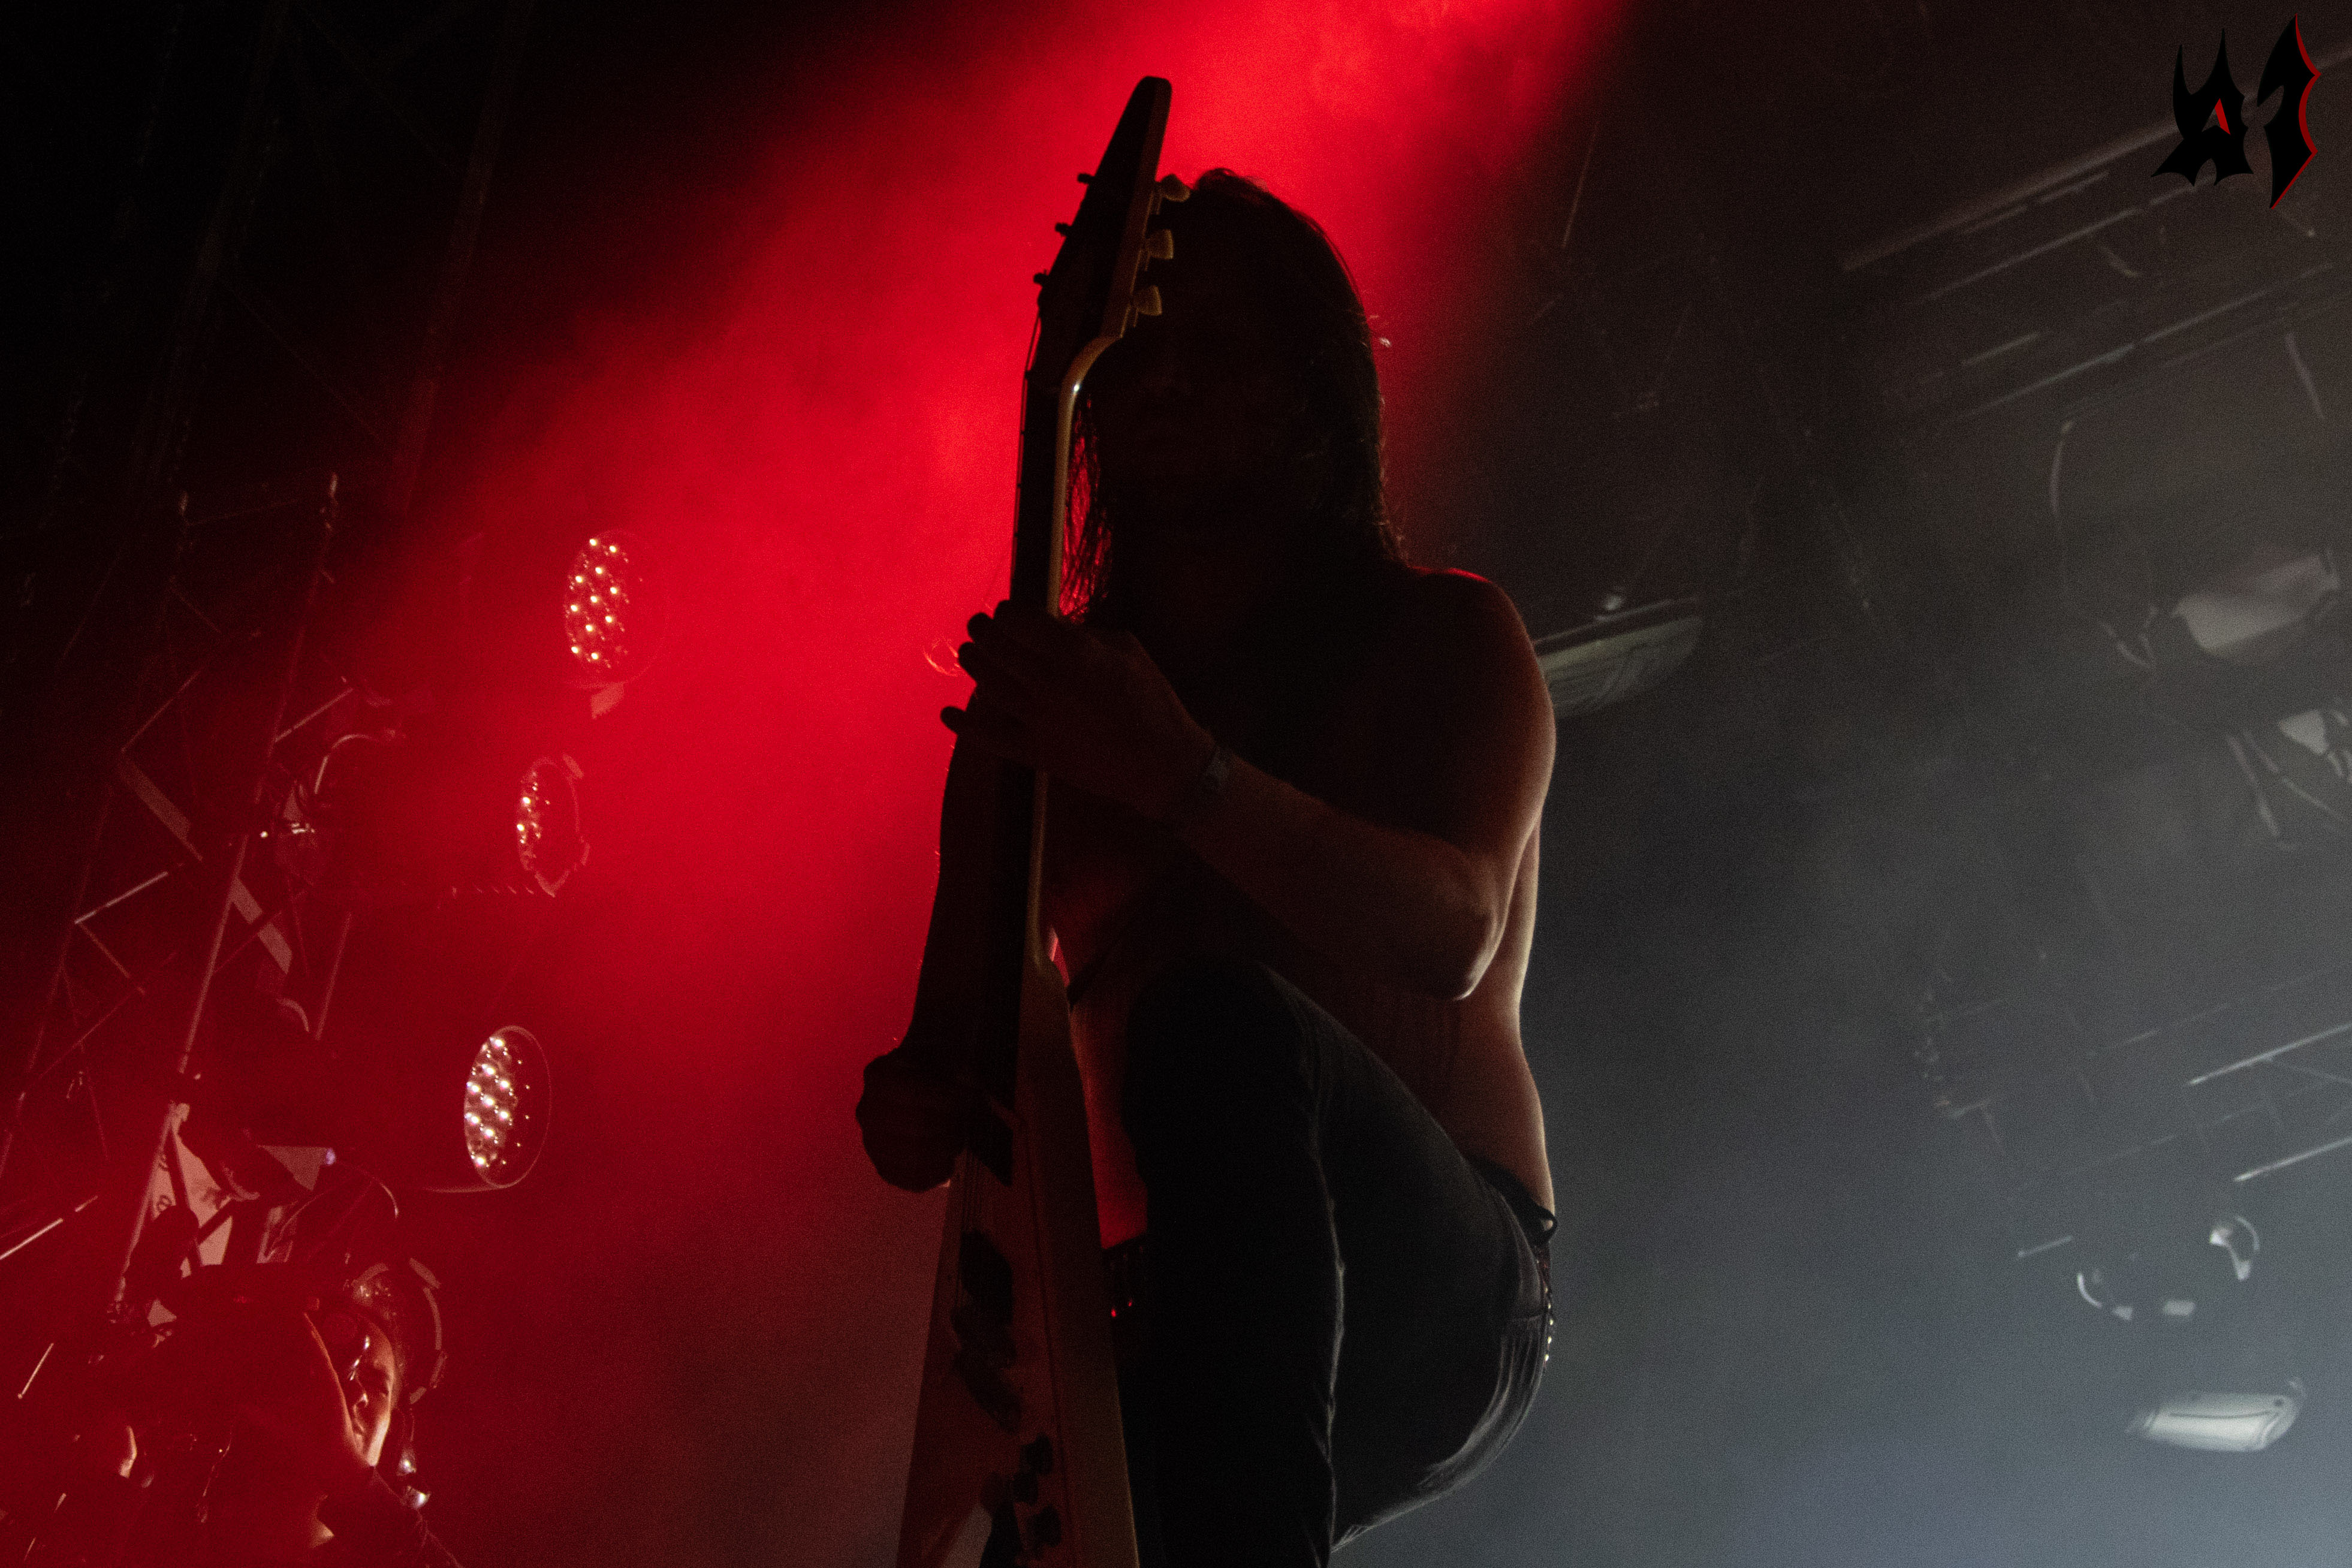 Hellfest - Bloodbath - 2